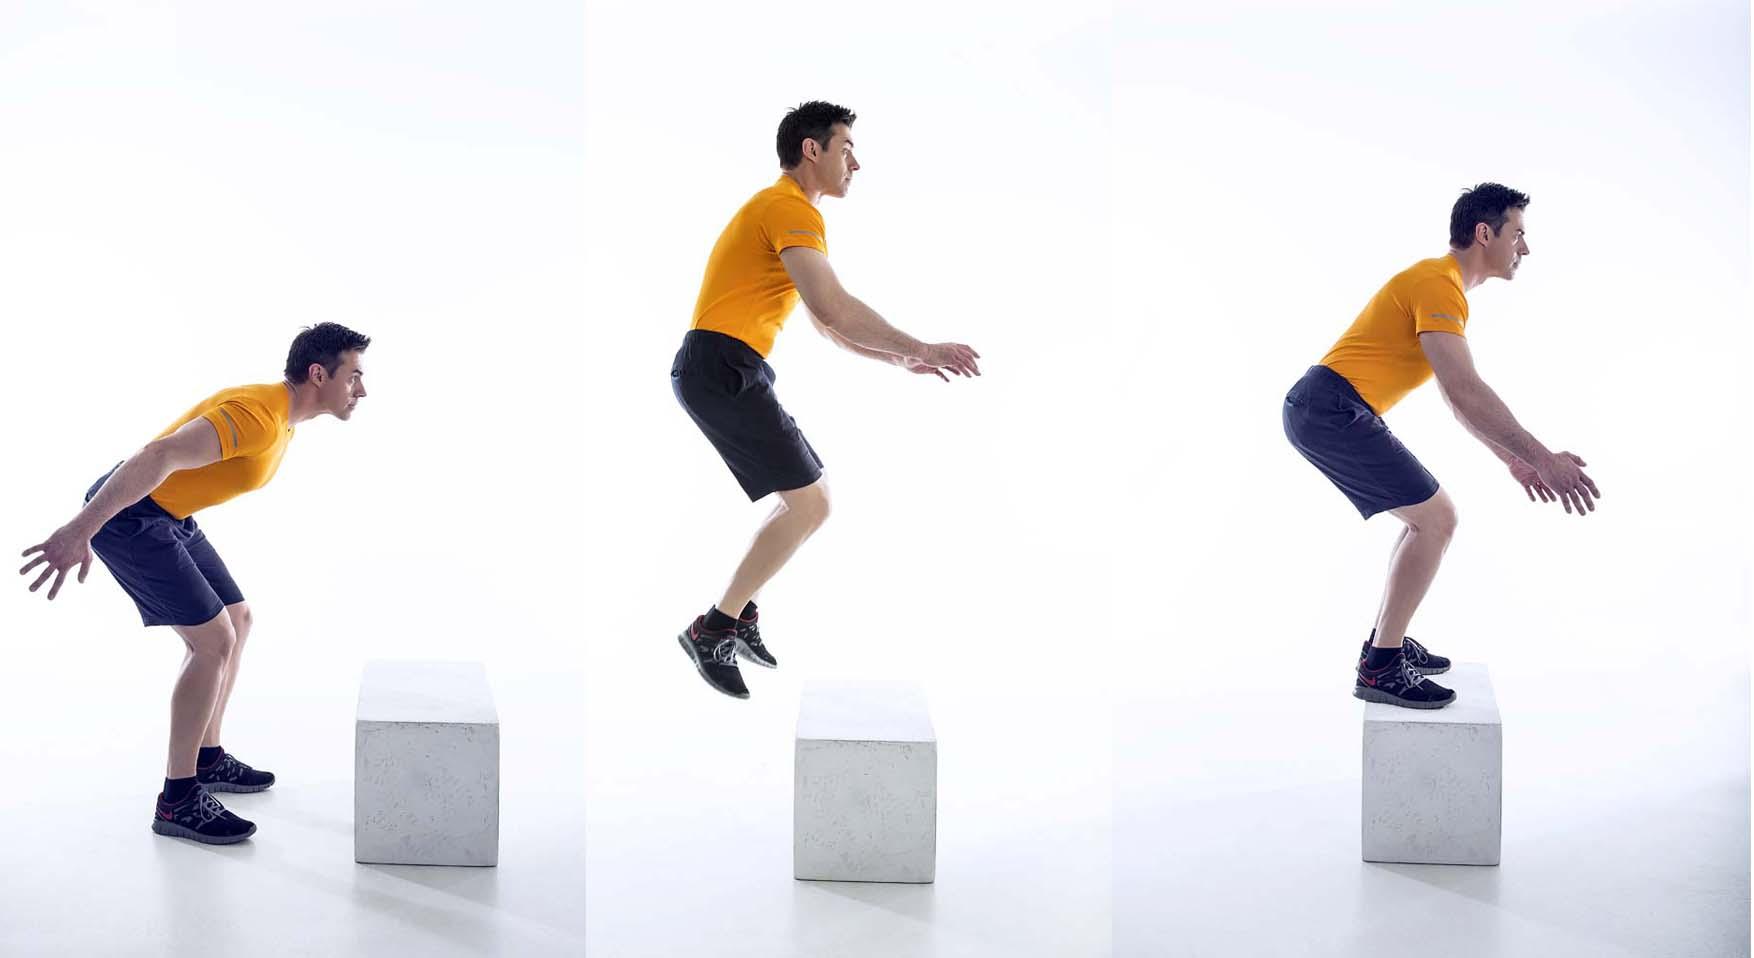 ejercicios banco box jumps